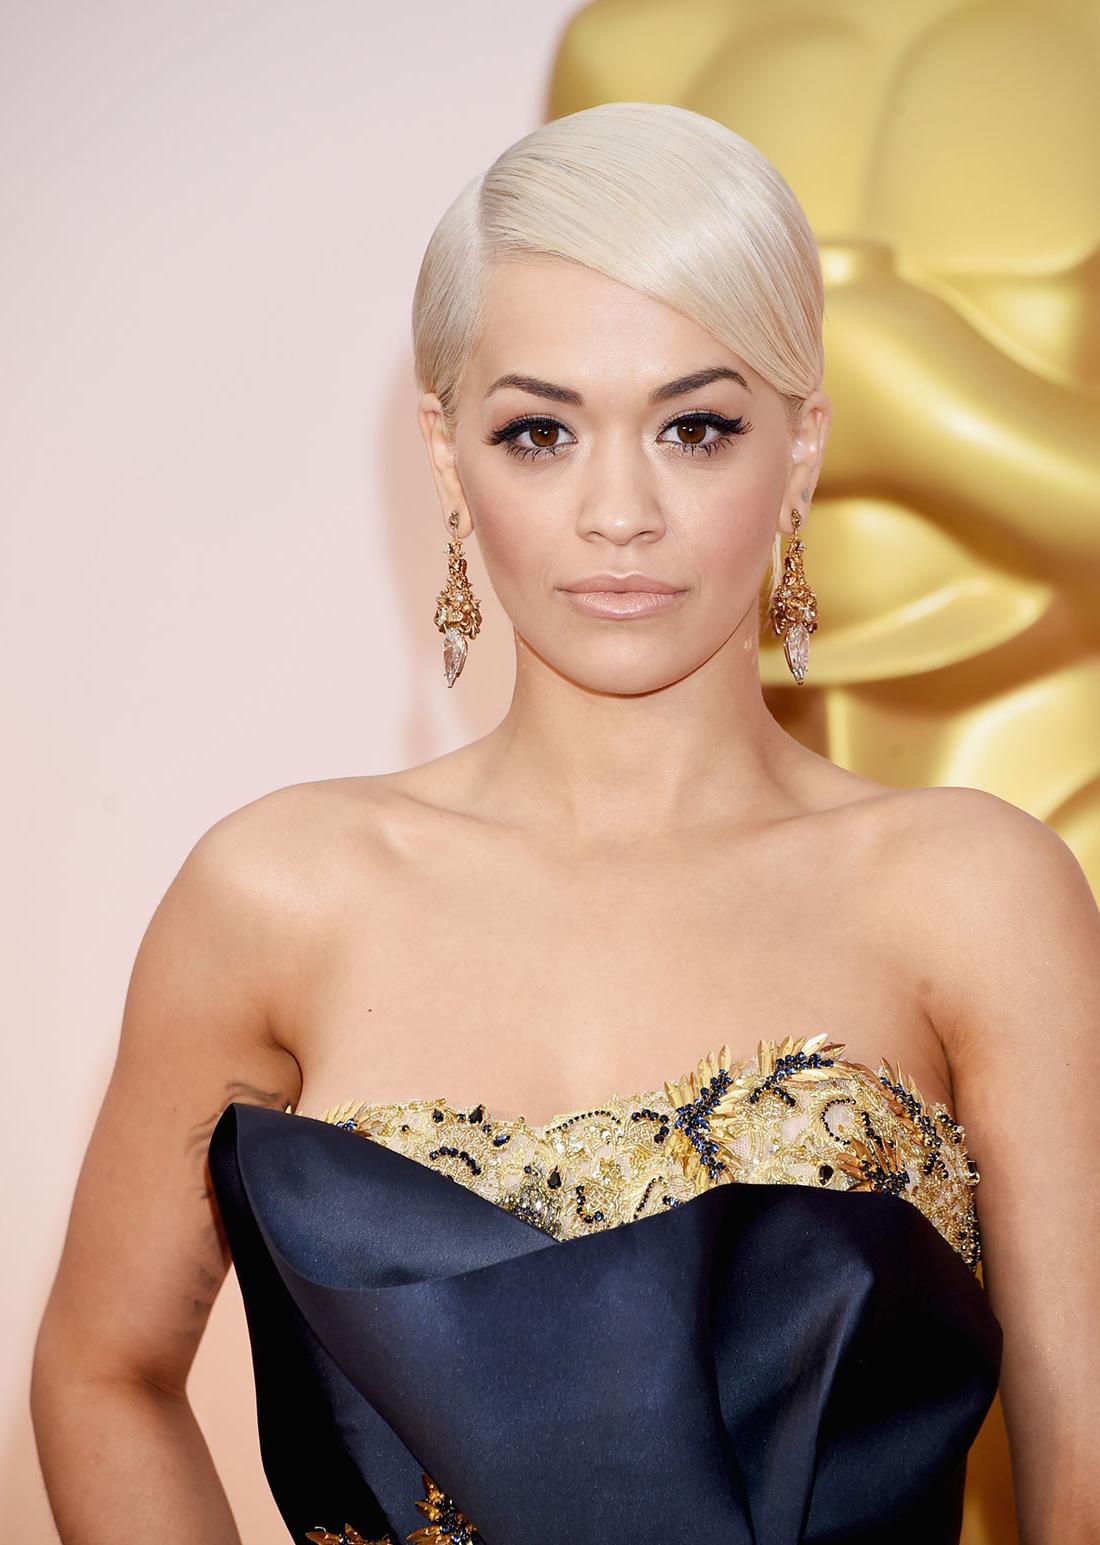 Rita Ora Short Hairstyles – Hairstyle For Women & Man In Rita Ora Short Hairstyles (View 18 of 25)